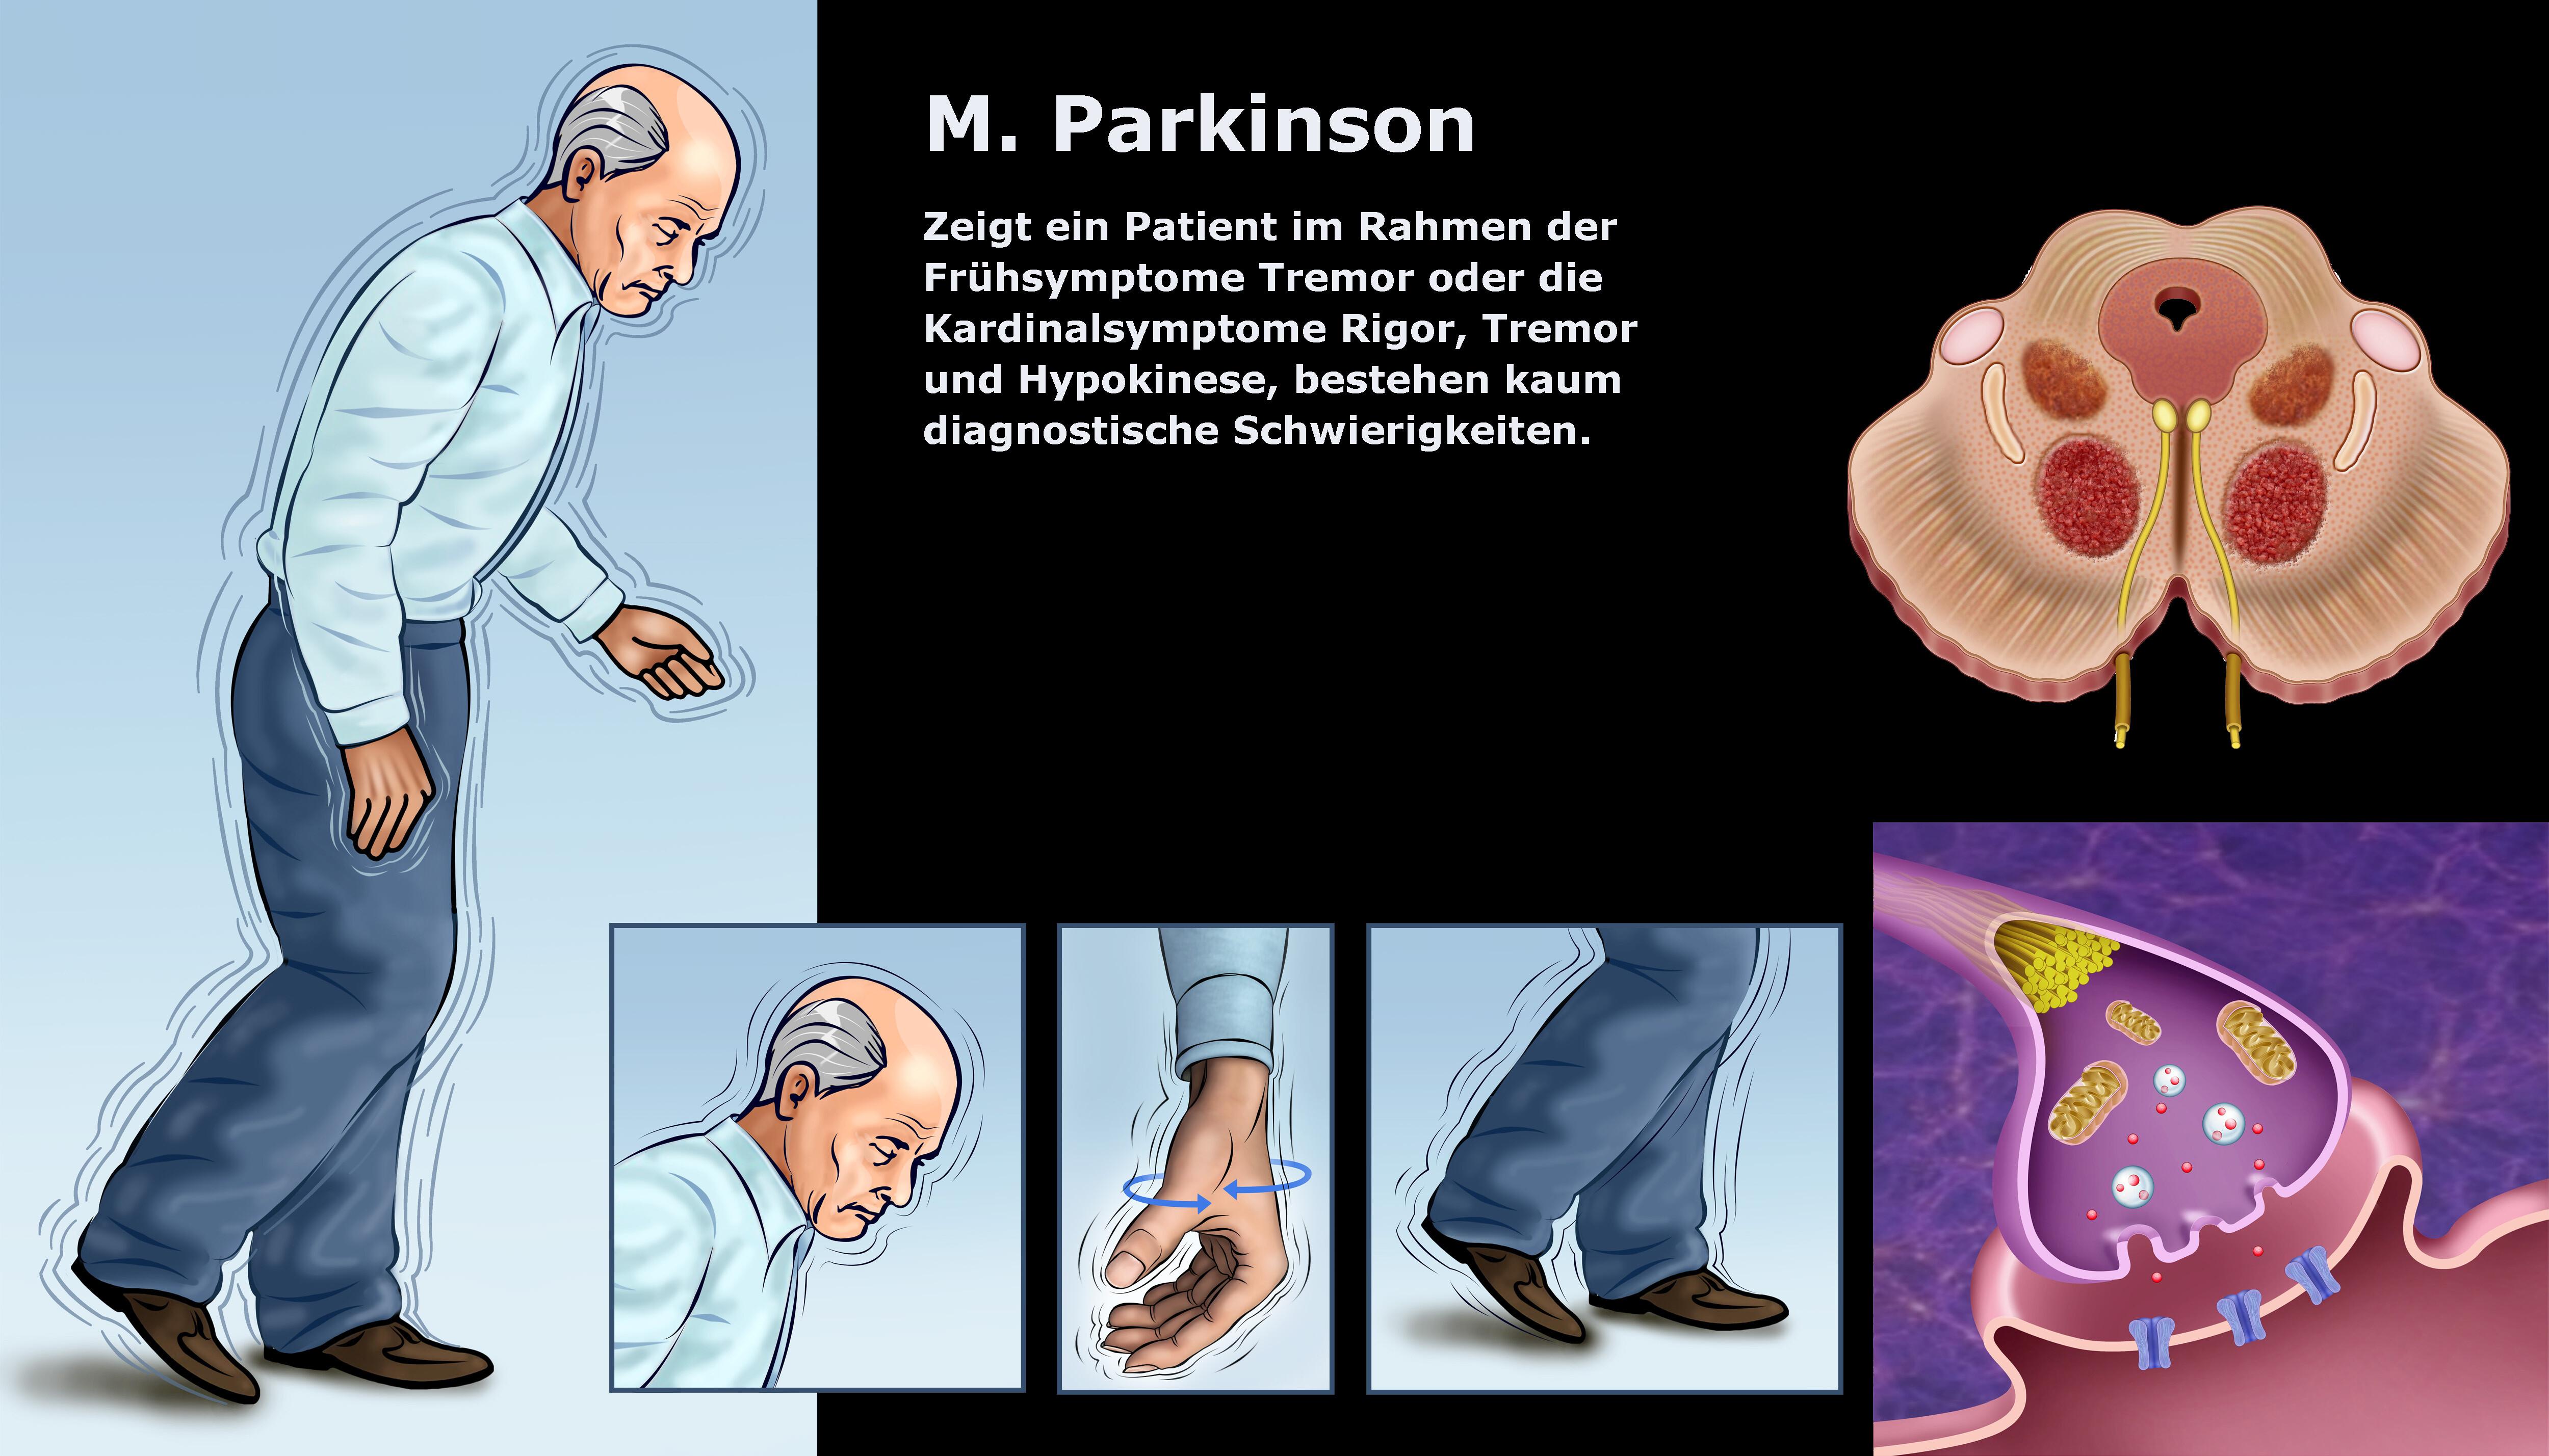 M. Parkinson © Alexilusmedical / shutterstock.com